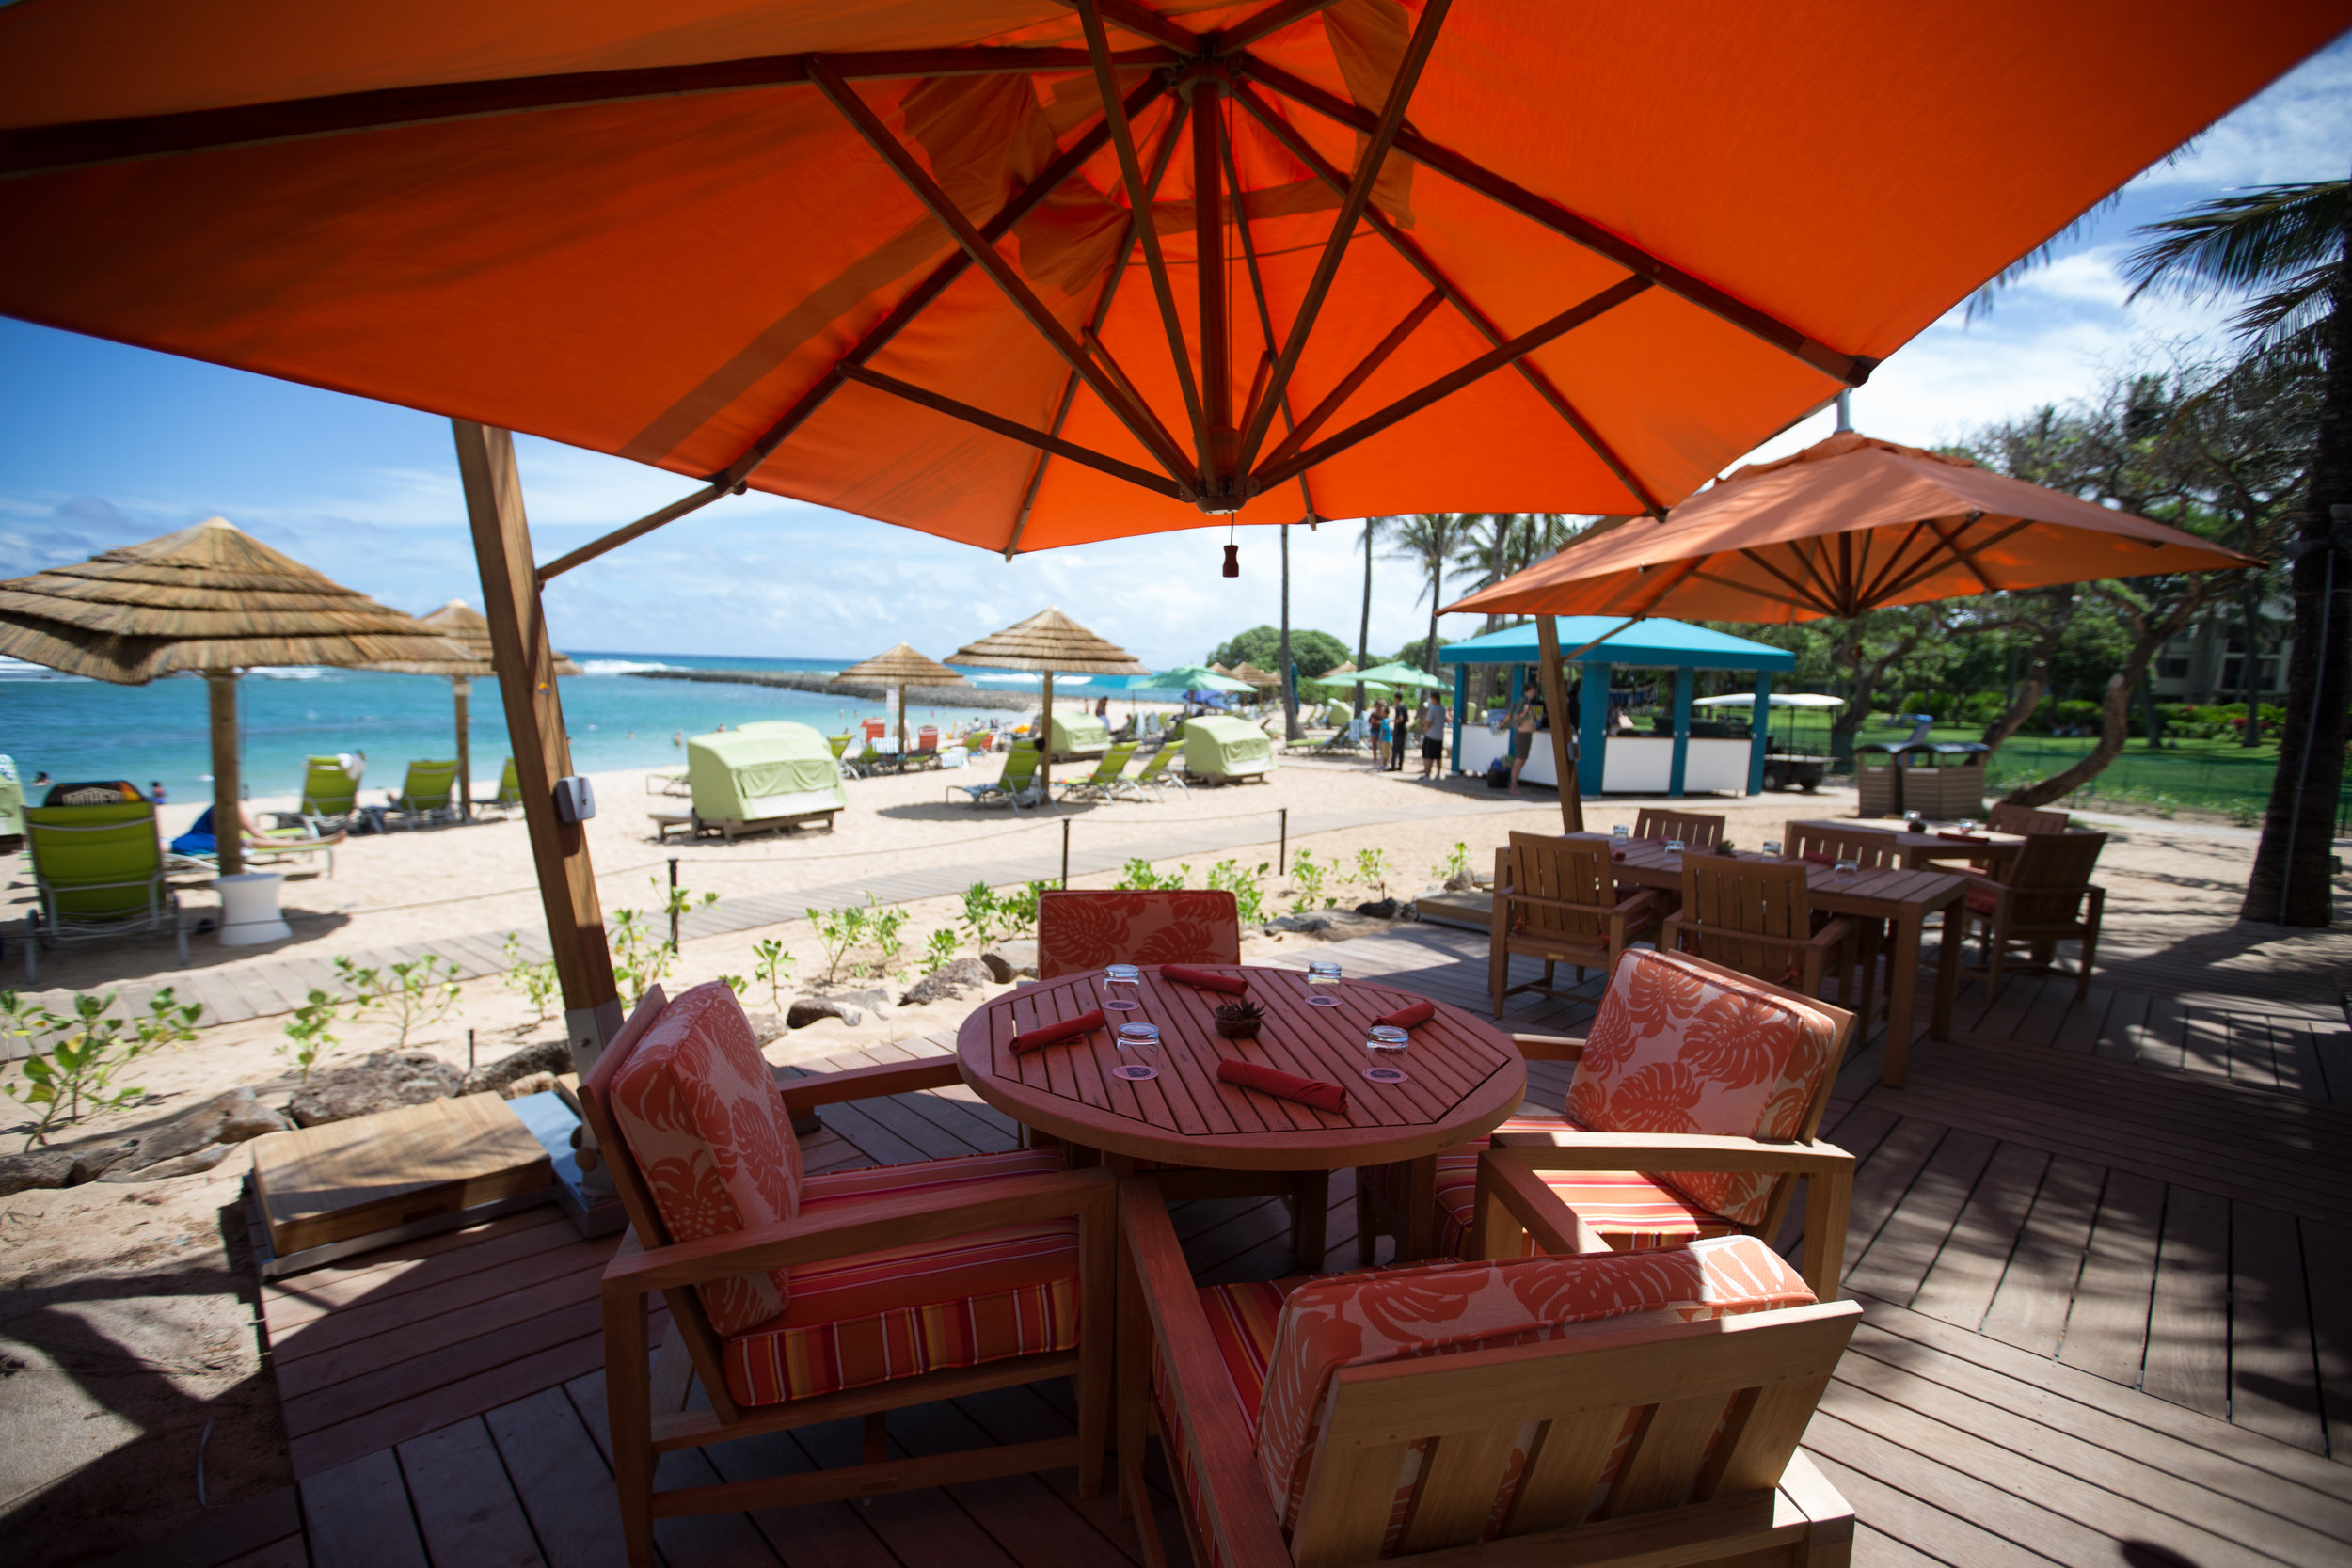 08_Roy's Beach House_Interior_pc Craig Bixel_07-2016.jpg